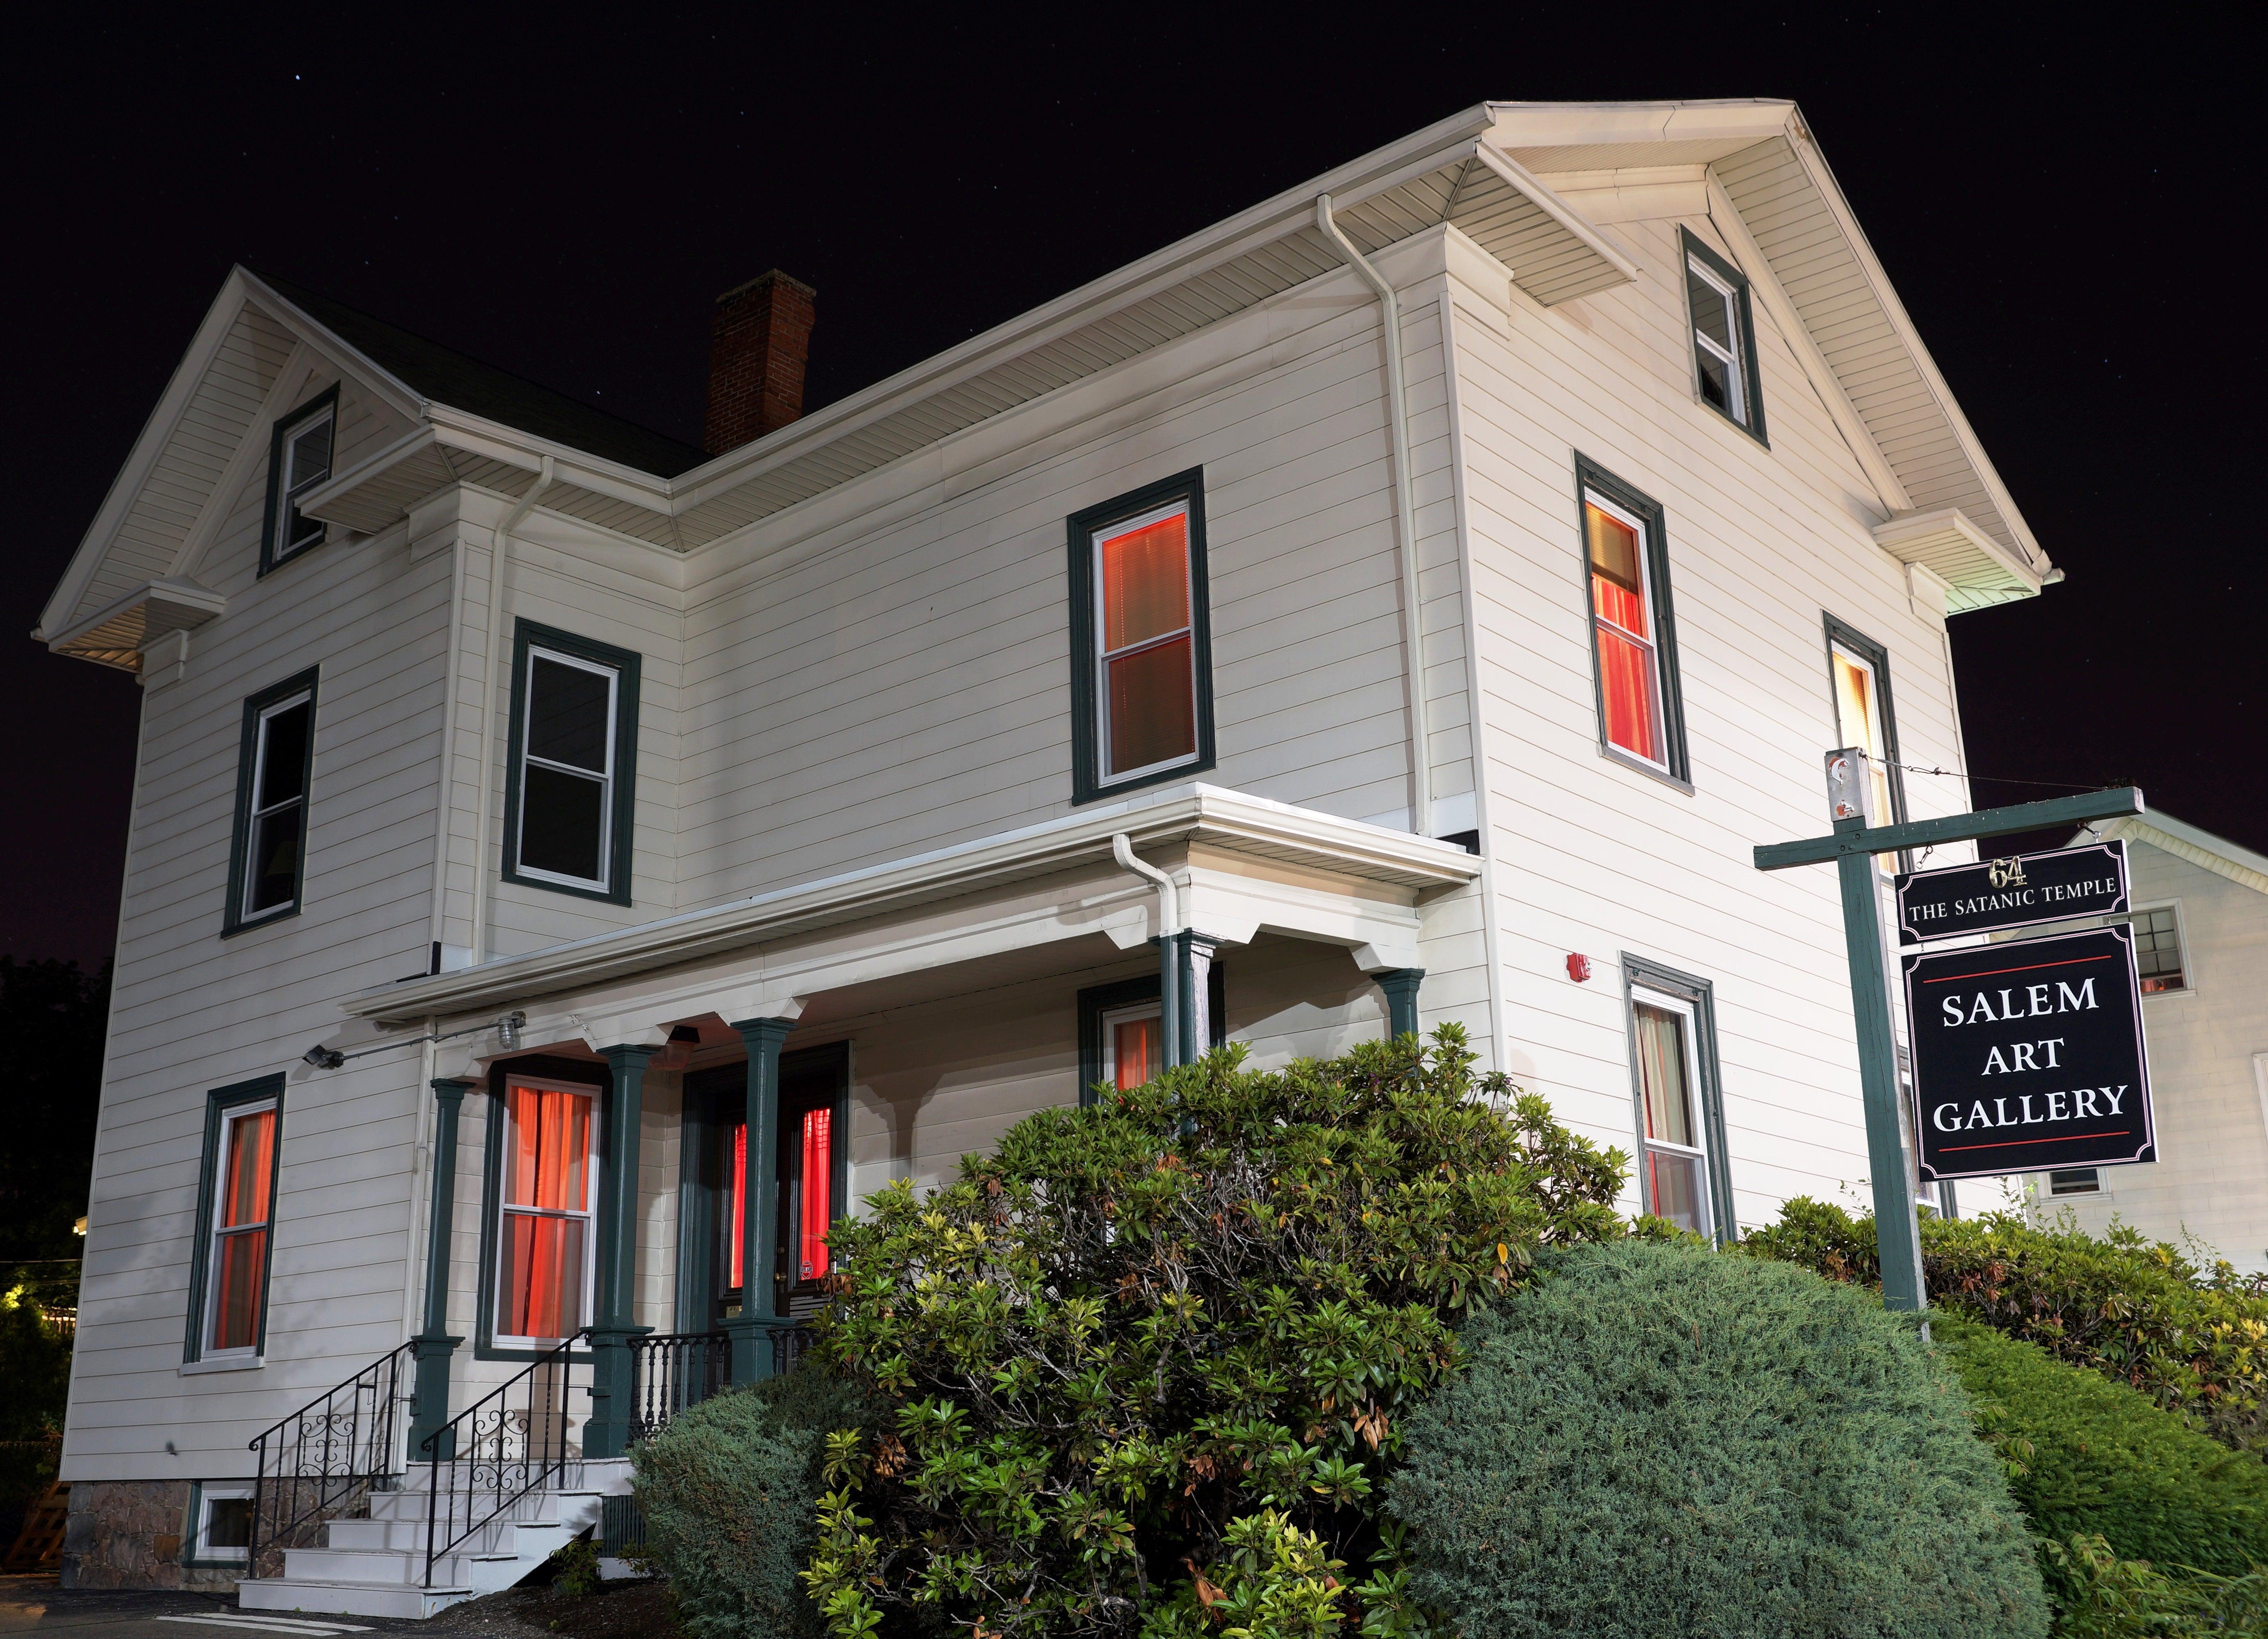 The Satanic Temple building on Bridge Street in Salem.